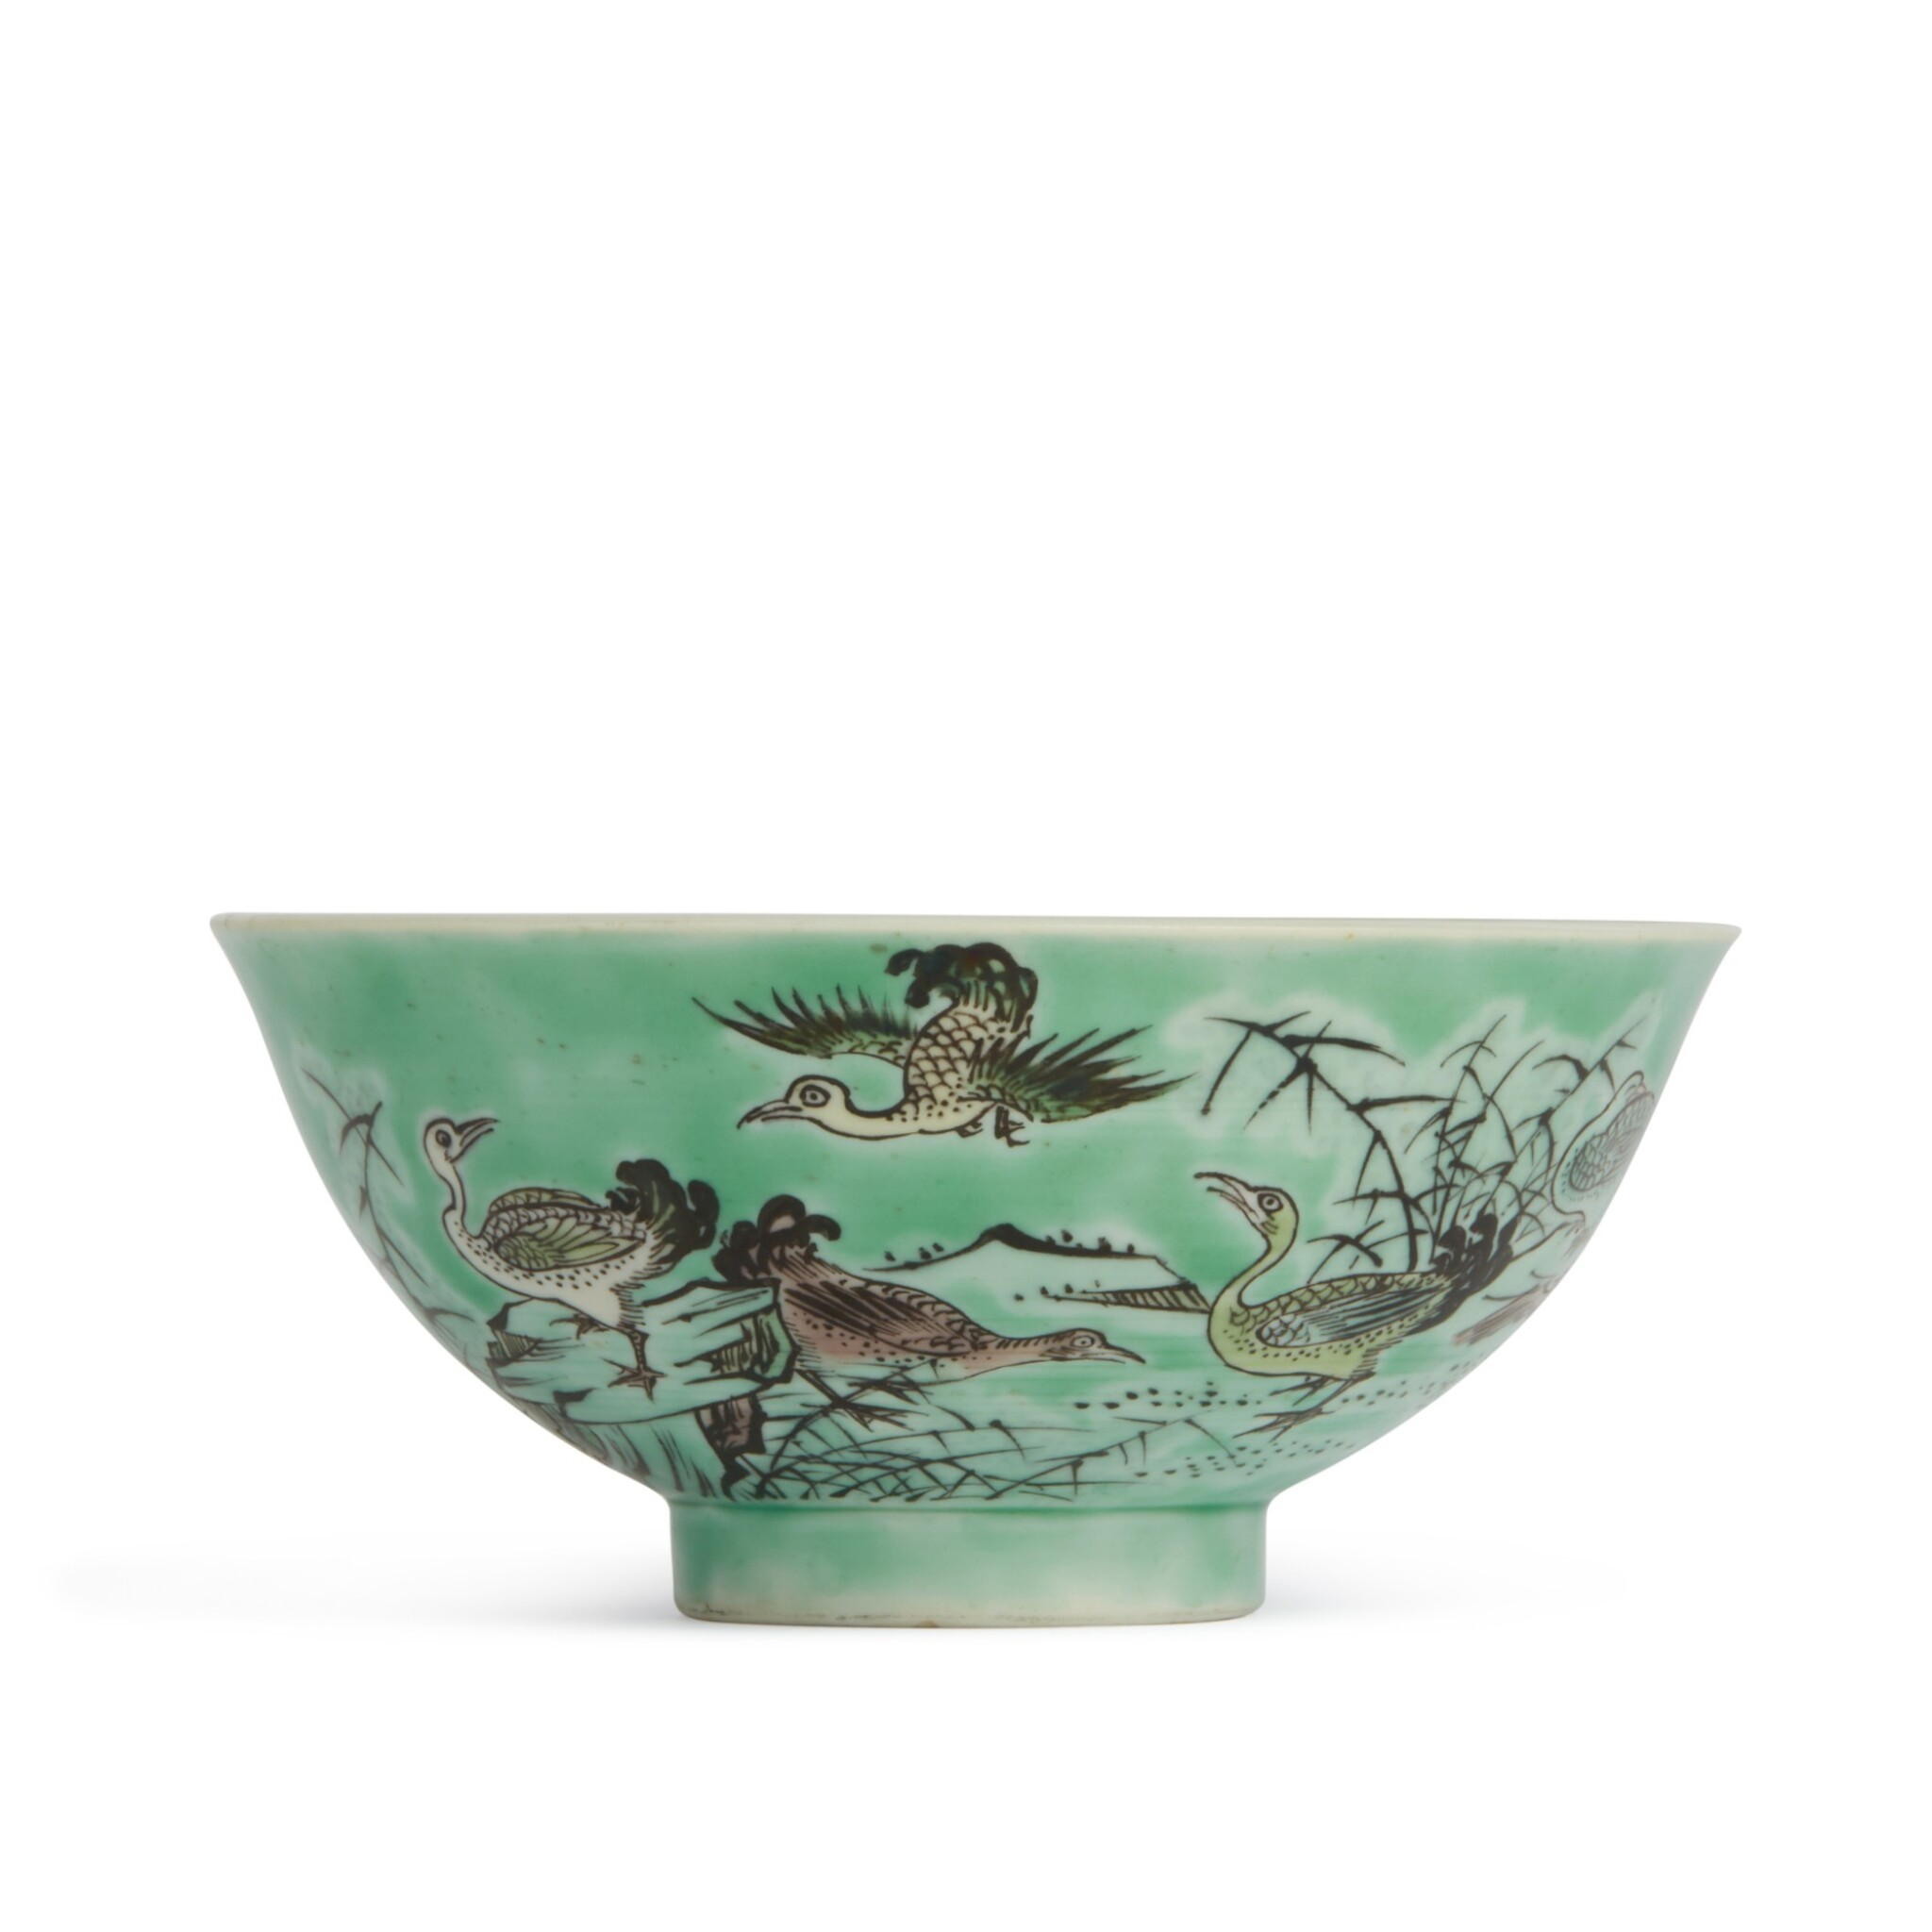 View full screen - View 1 of Lot 202. A biscuit-glazed famille-verte 'ducks' bowl, 20th century | 二十世紀 素三彩鴛鴦蘆葦圖盌 《大清康熙年製》仿款.